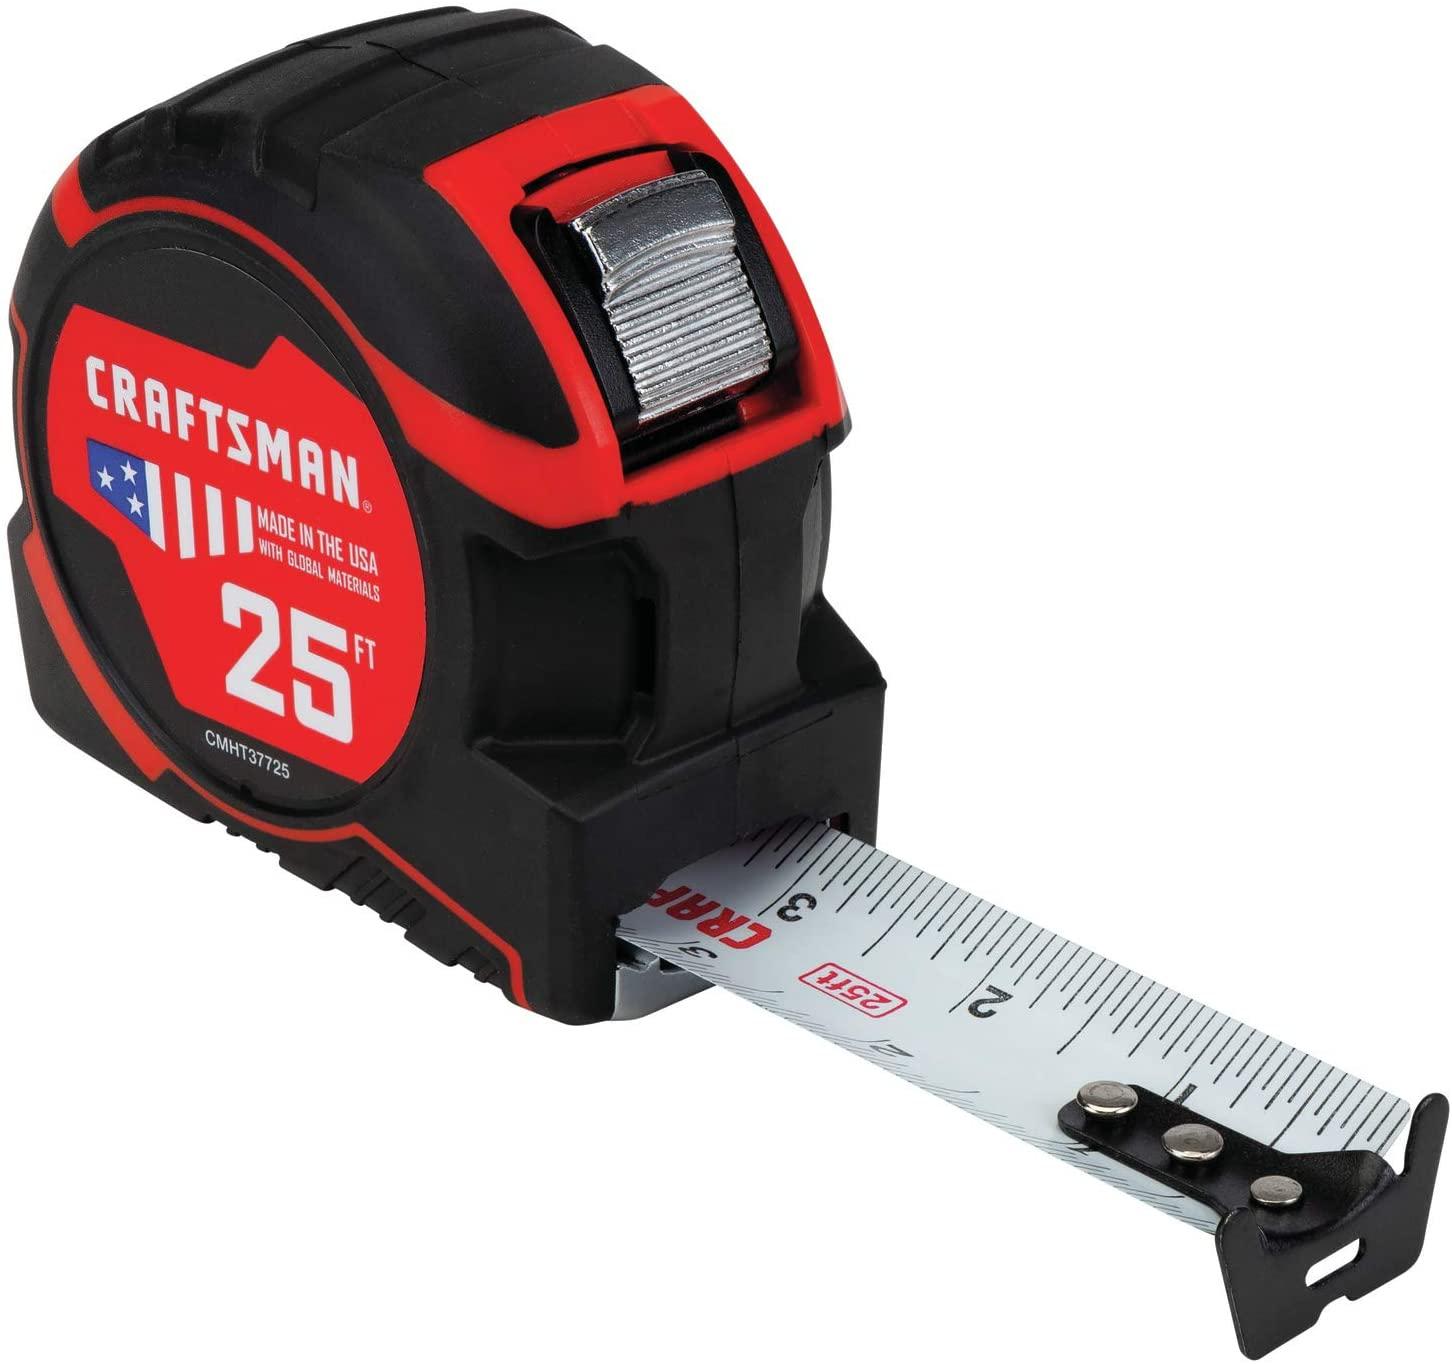 CRAFTSMAN Tape Measure 25-Foot (CMHT37725S)